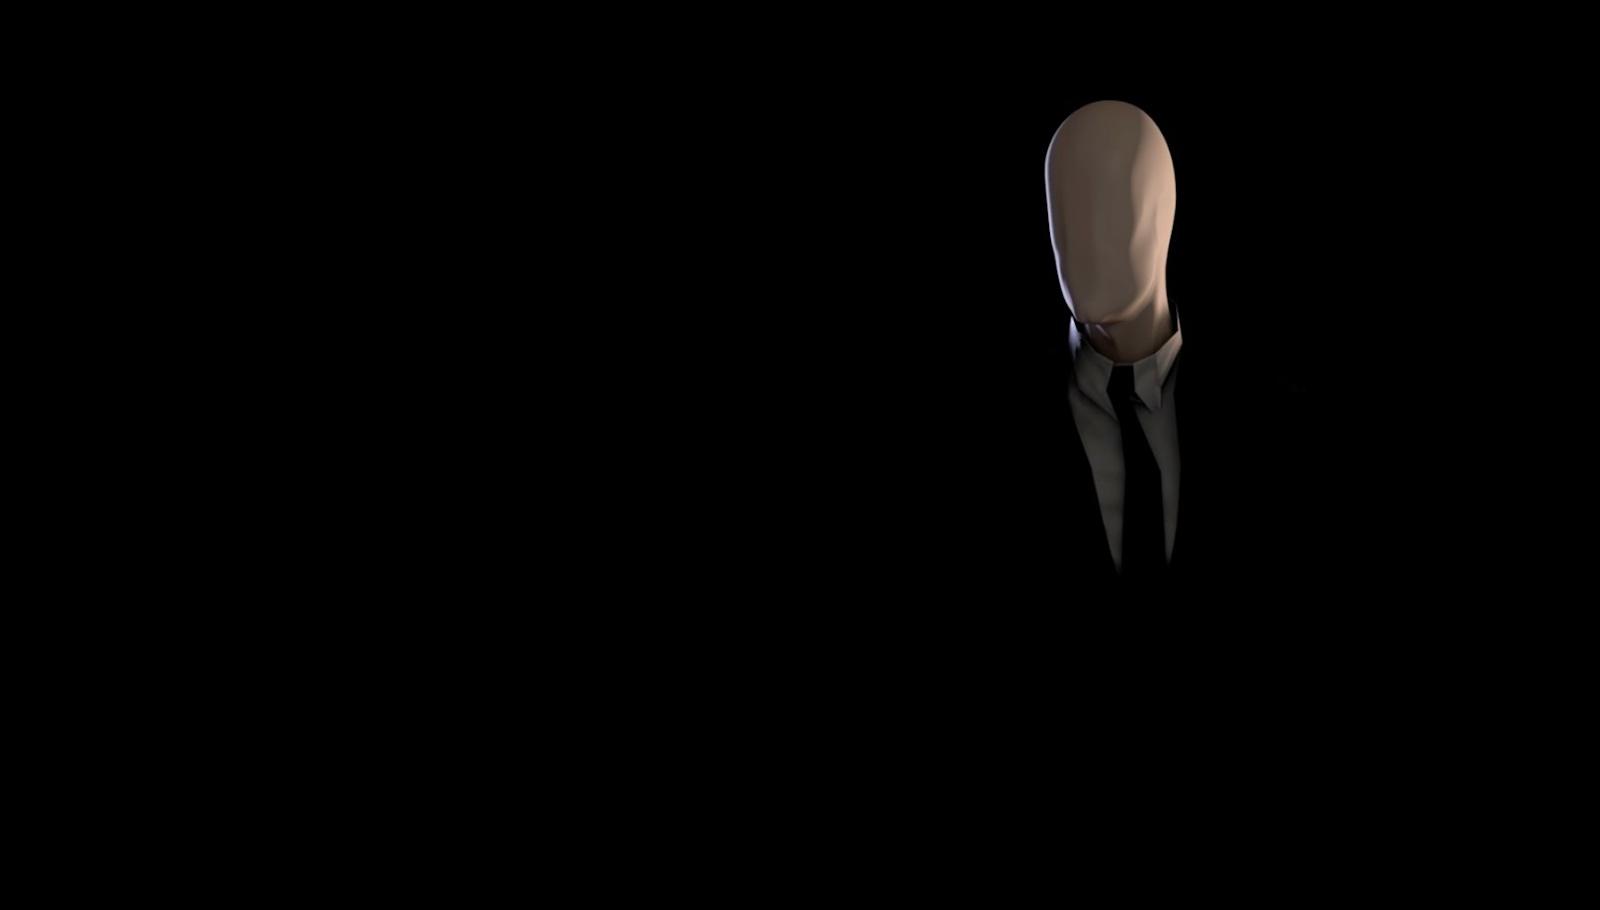 slender man wallpaper 1 - photo #29